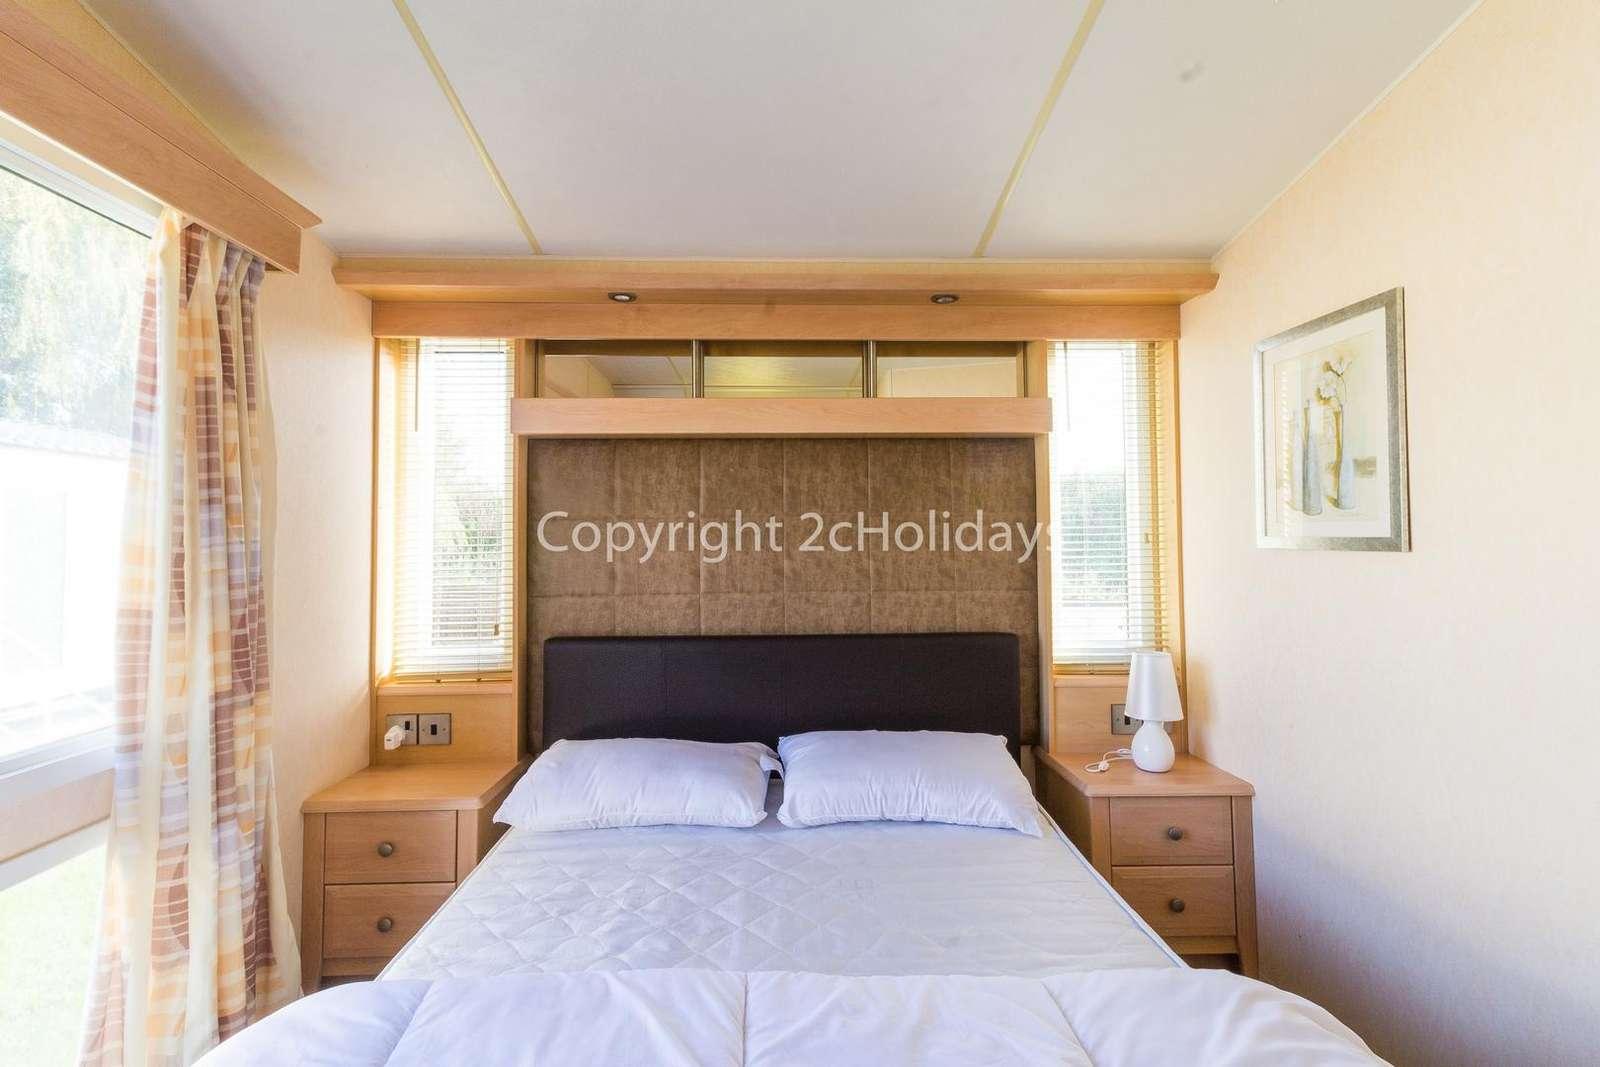 The master bedroom includes an en-suite!